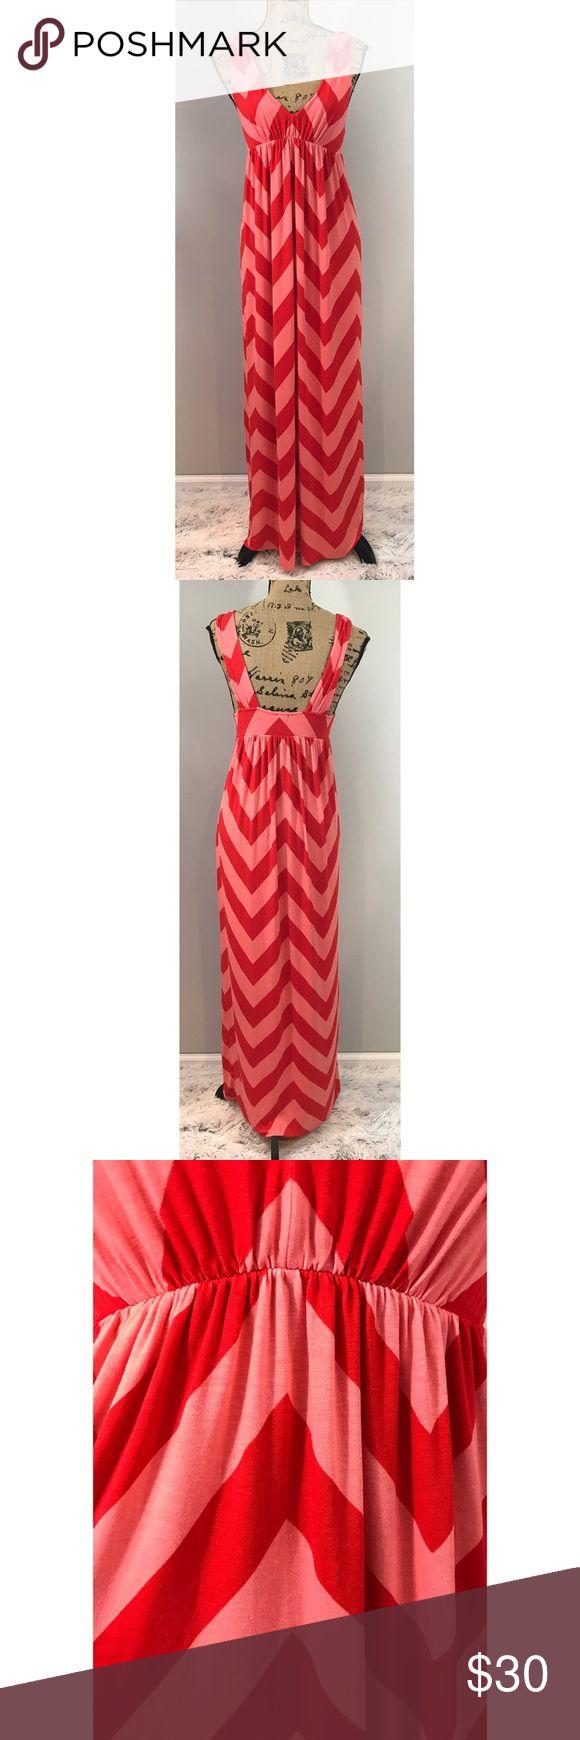 "JCrew orange Chevron Maxi dress JCrew. Medium. Fits like Small. V-neck, chevron maxi dress in coral and orange. Elastic under bust. Has stretch. Sold out online. Retail $84.50. B: 17"", Under bust: 13""-18"", H: 23"" L: 57"" J. Crew Dresses Maxi"